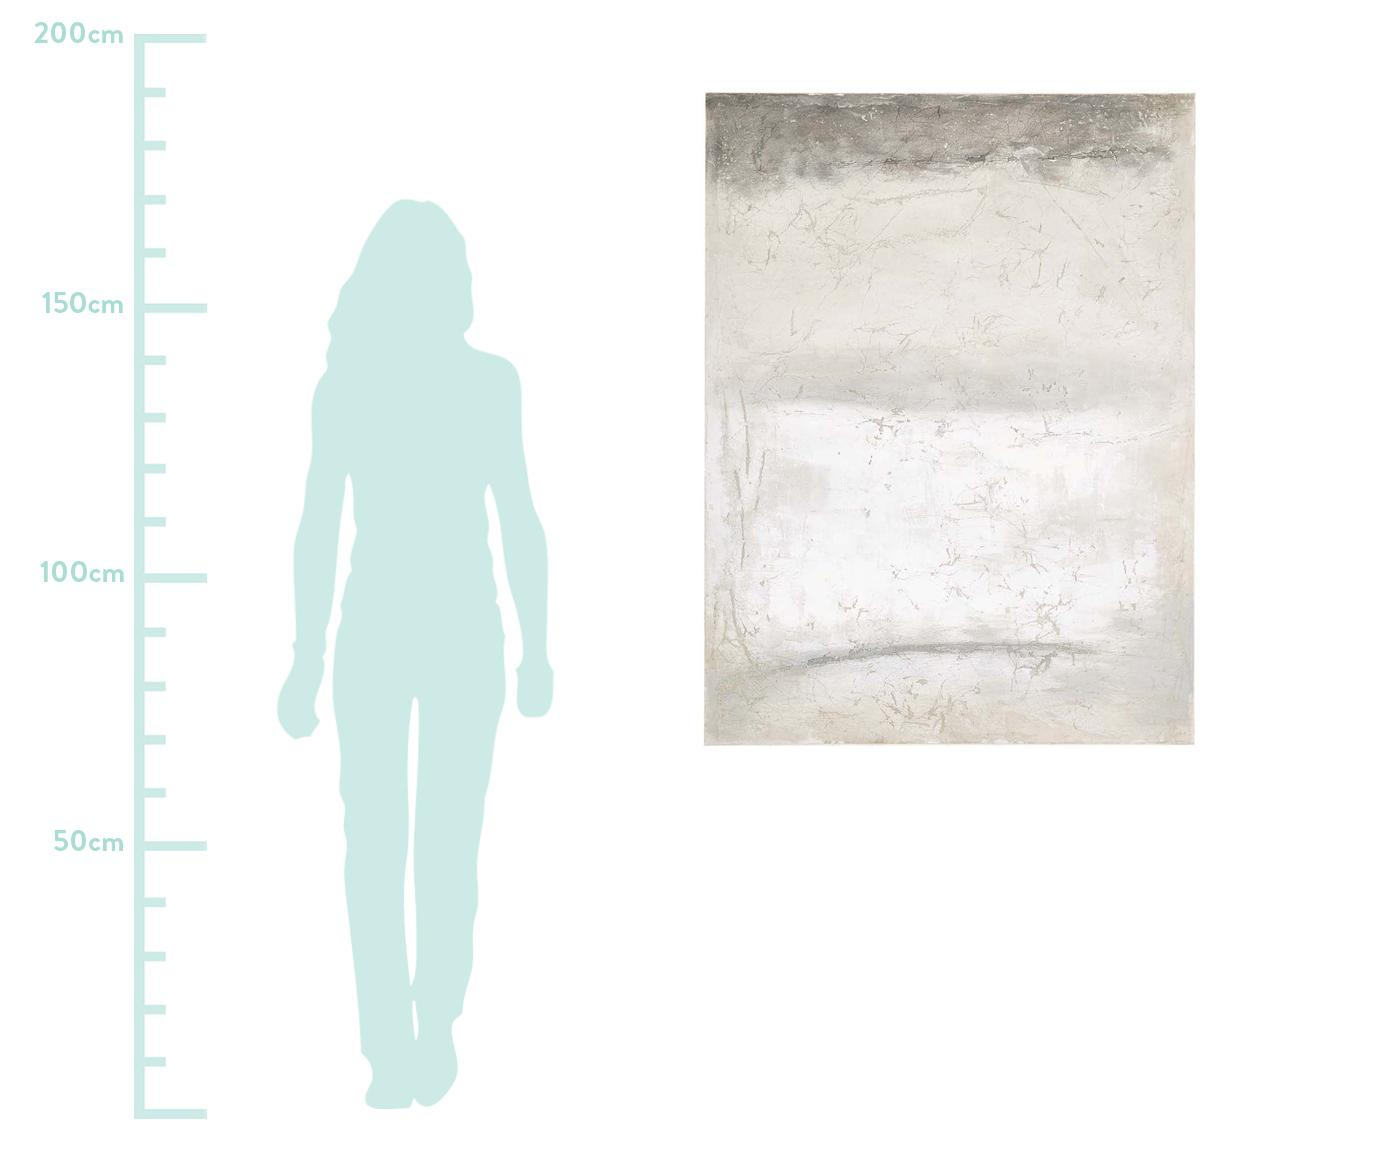 Handbemalter Leinwanddruck Shapes, Bild: Digitaldruck auf Leinwand, Grau, 90 x 120 cm